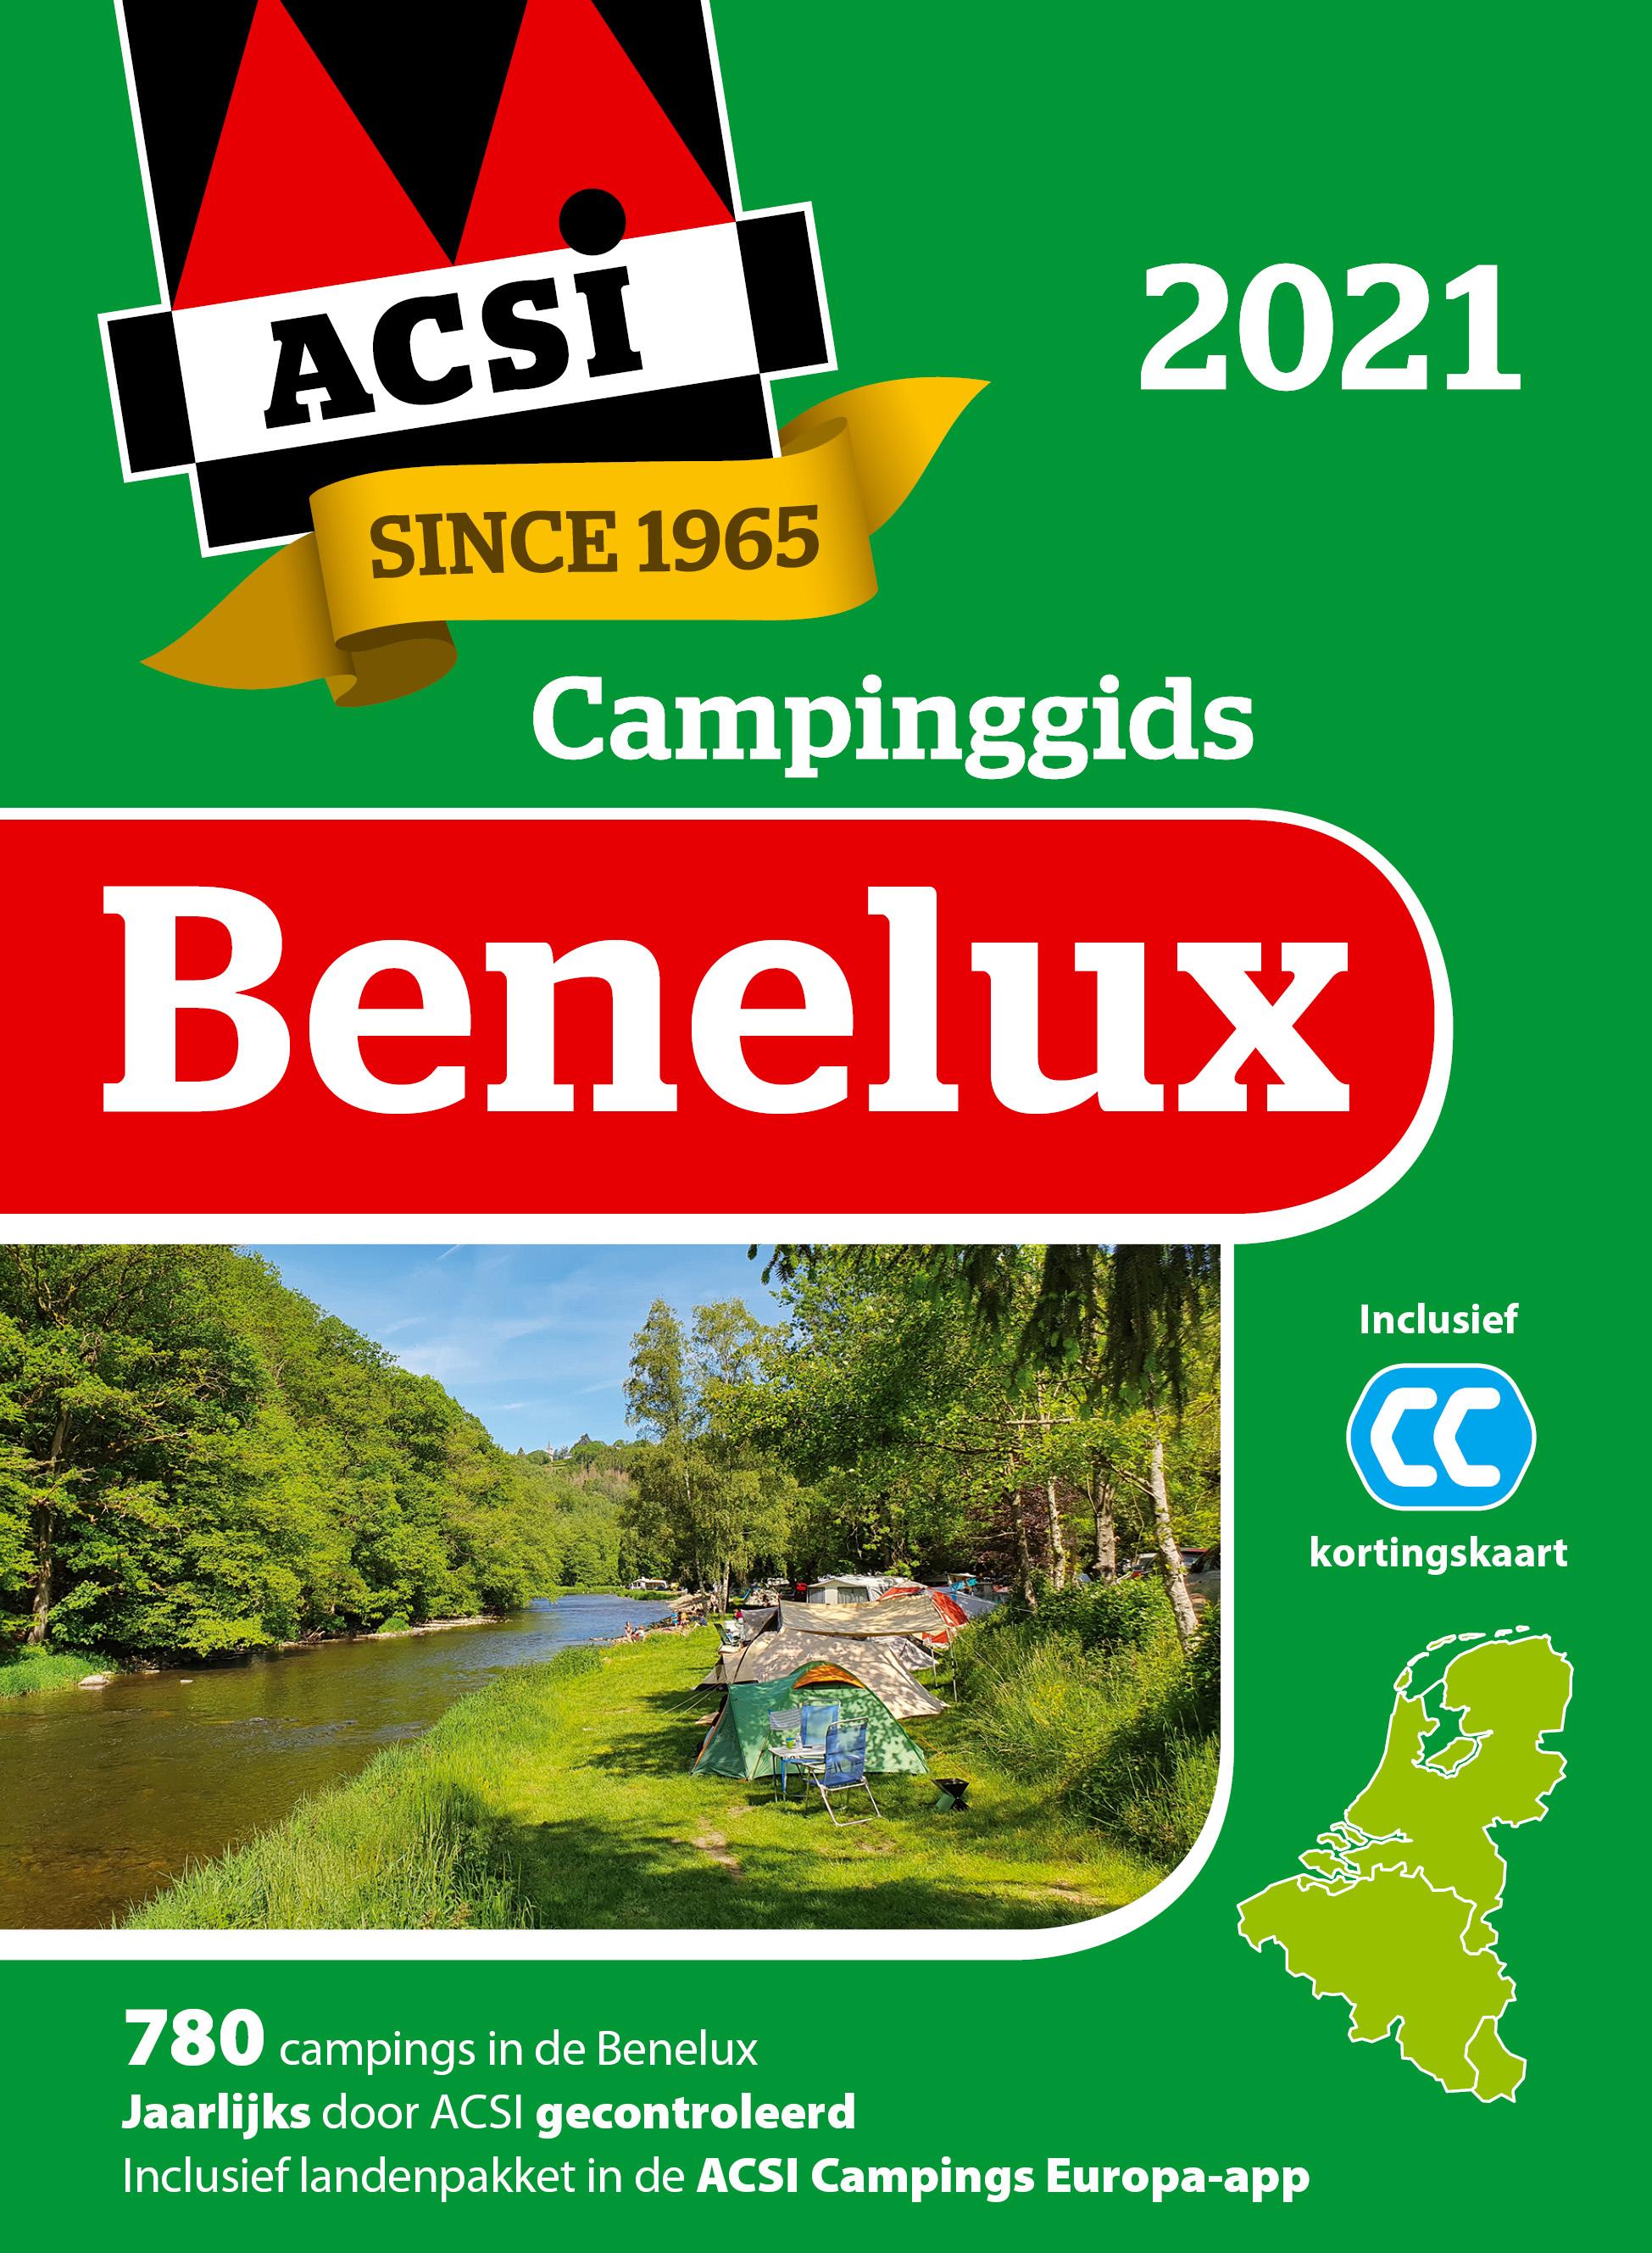 Acsi Campinggids Benelux 2021 + App